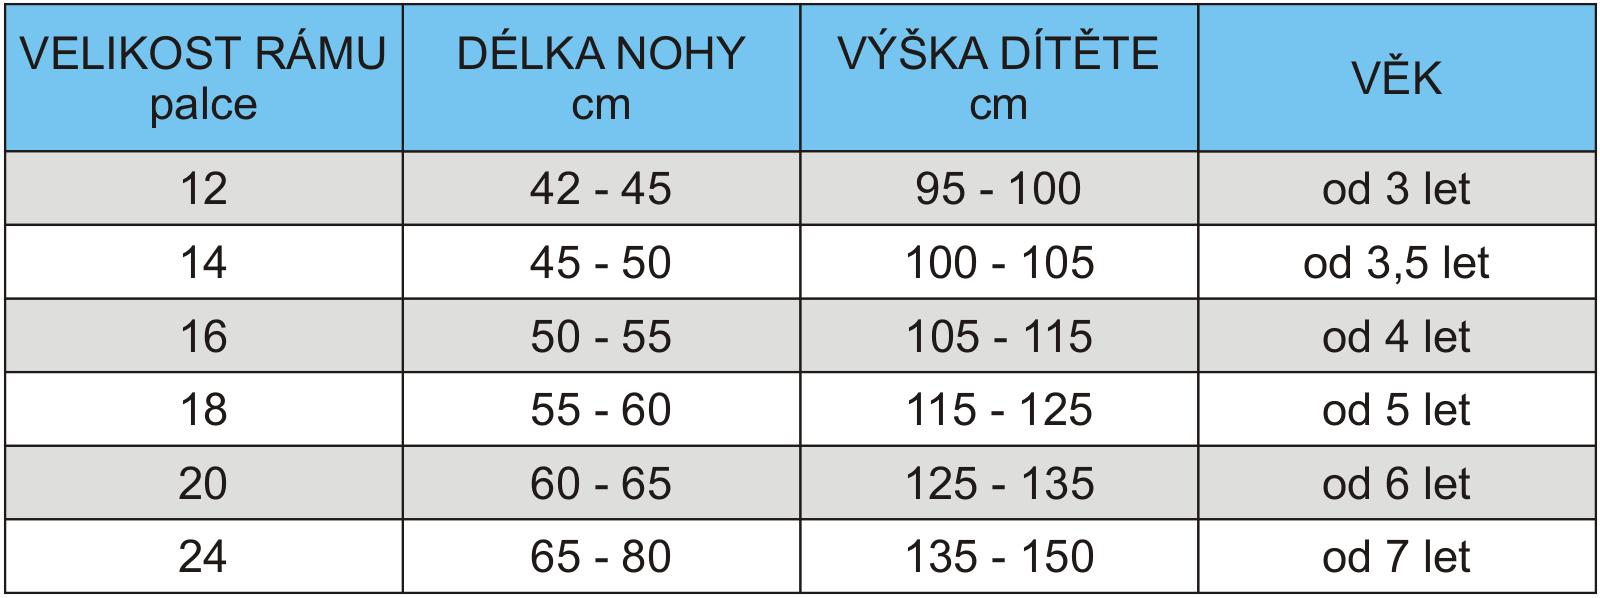 Tabulky velikostí kol - MOXMA.CZ 6b30bab0a7